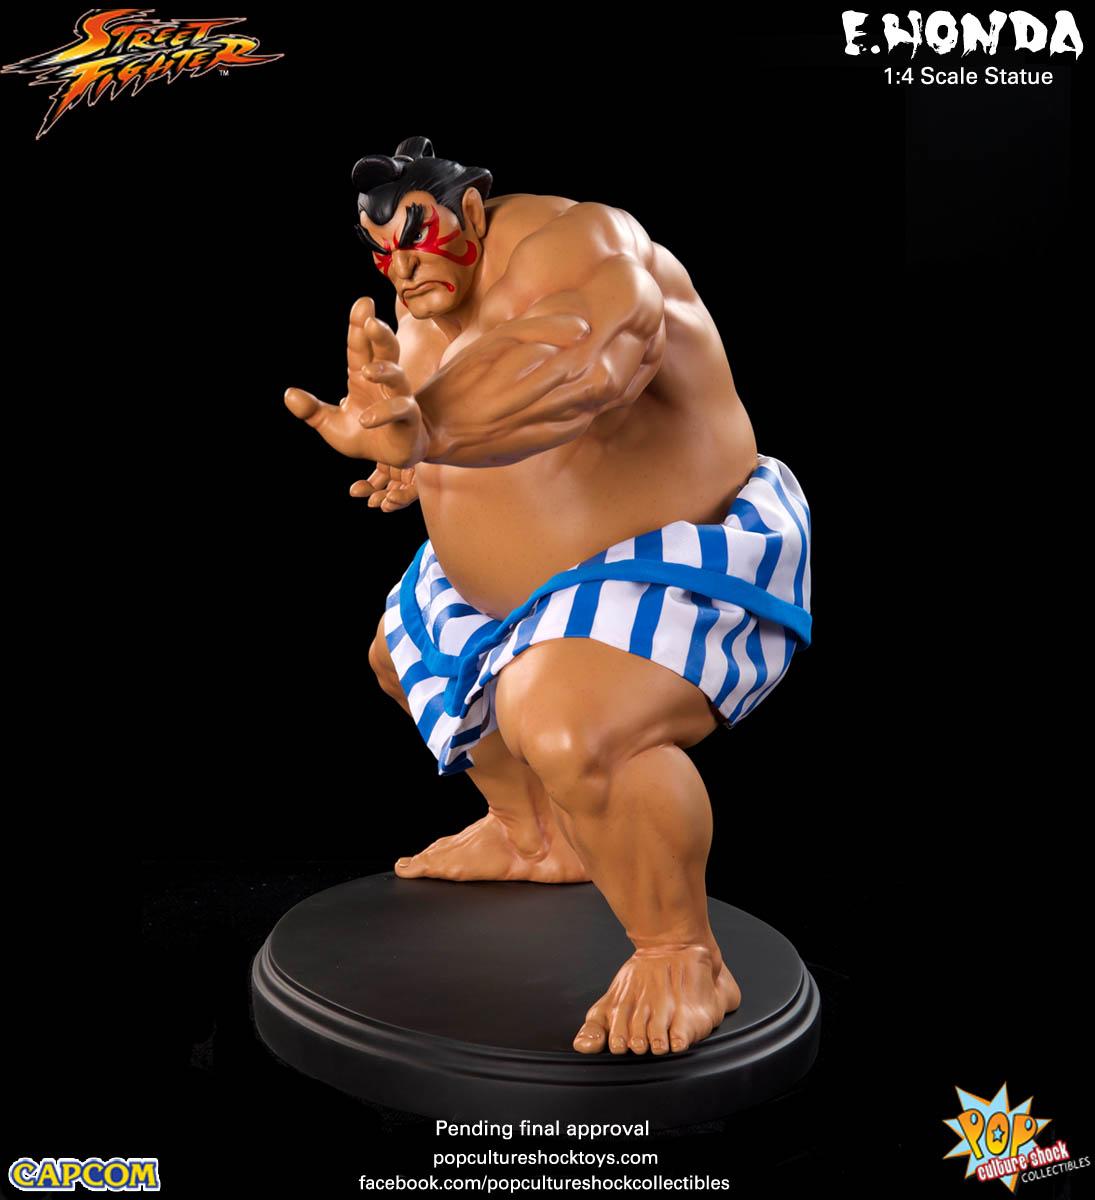 [Pop Culture Shock] Street Fighter: E. Honda 1/4 Statue - Página 3 Street-Fighter-E.-Honda-Regular-Statue-010